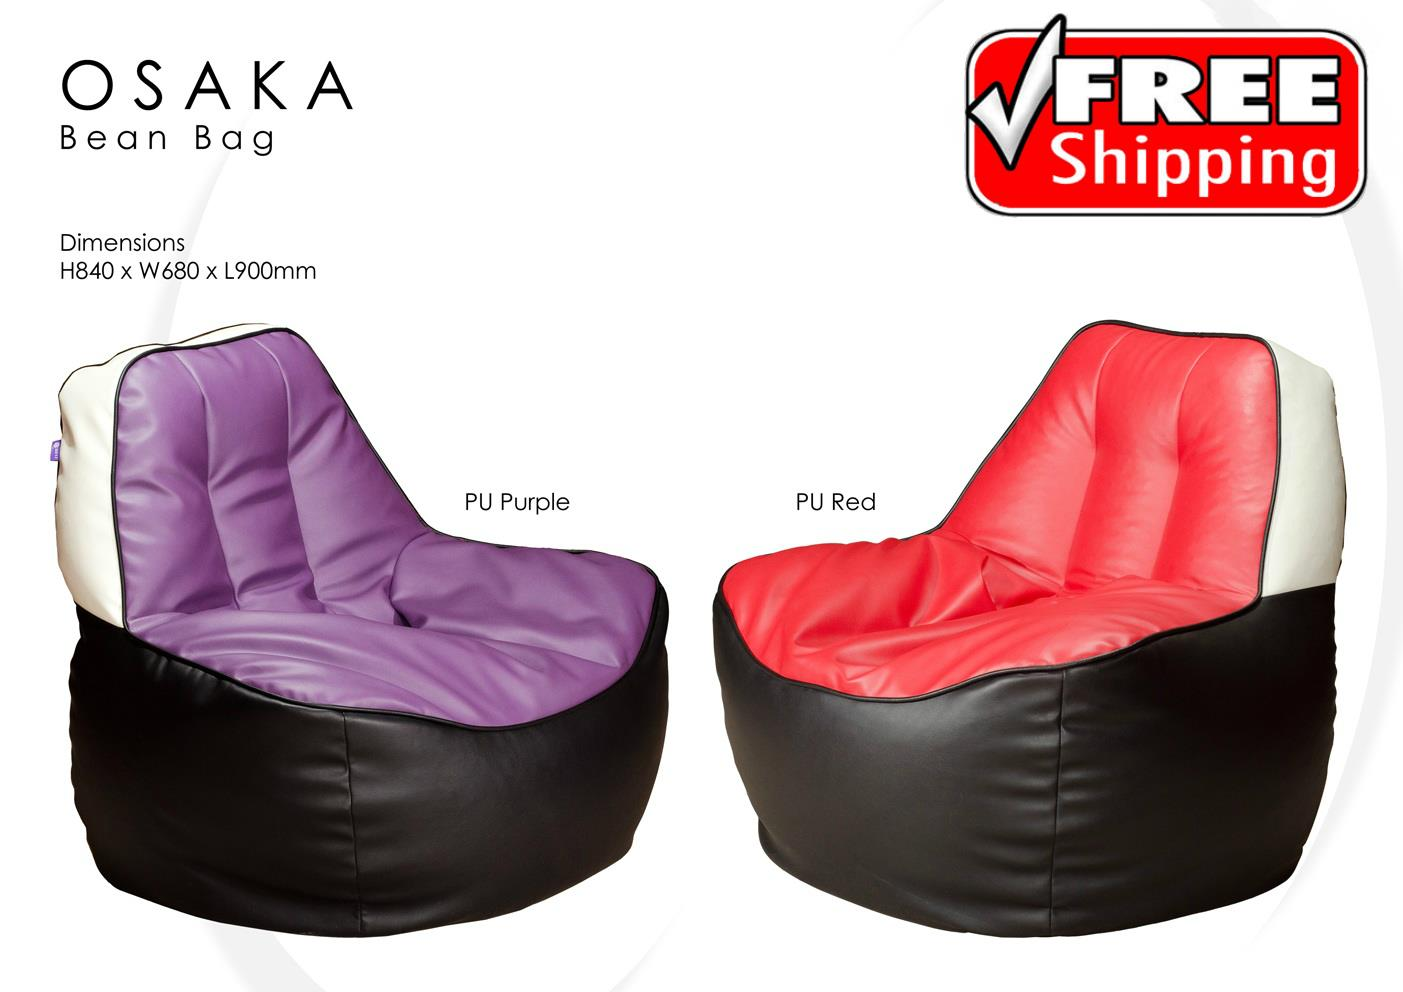 baby sofa chair malaysia hadley rooms to go bean bag high quality osaka cha